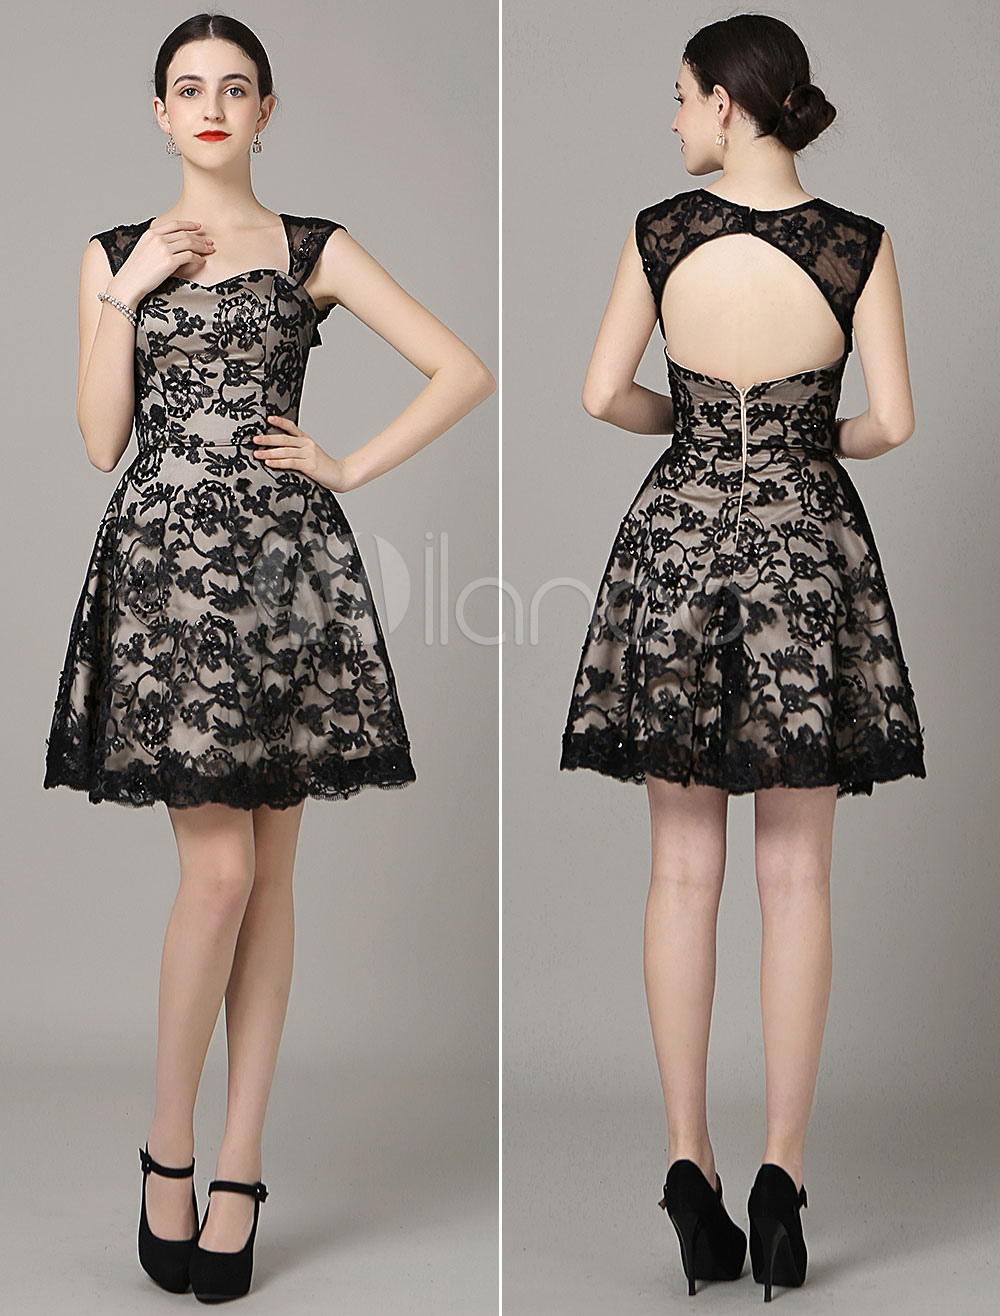 Backless Mini Prom Dress Sweetheart Black Lace Applique Cocktail Dress Milanoo (Wedding Prom Dresses) photo